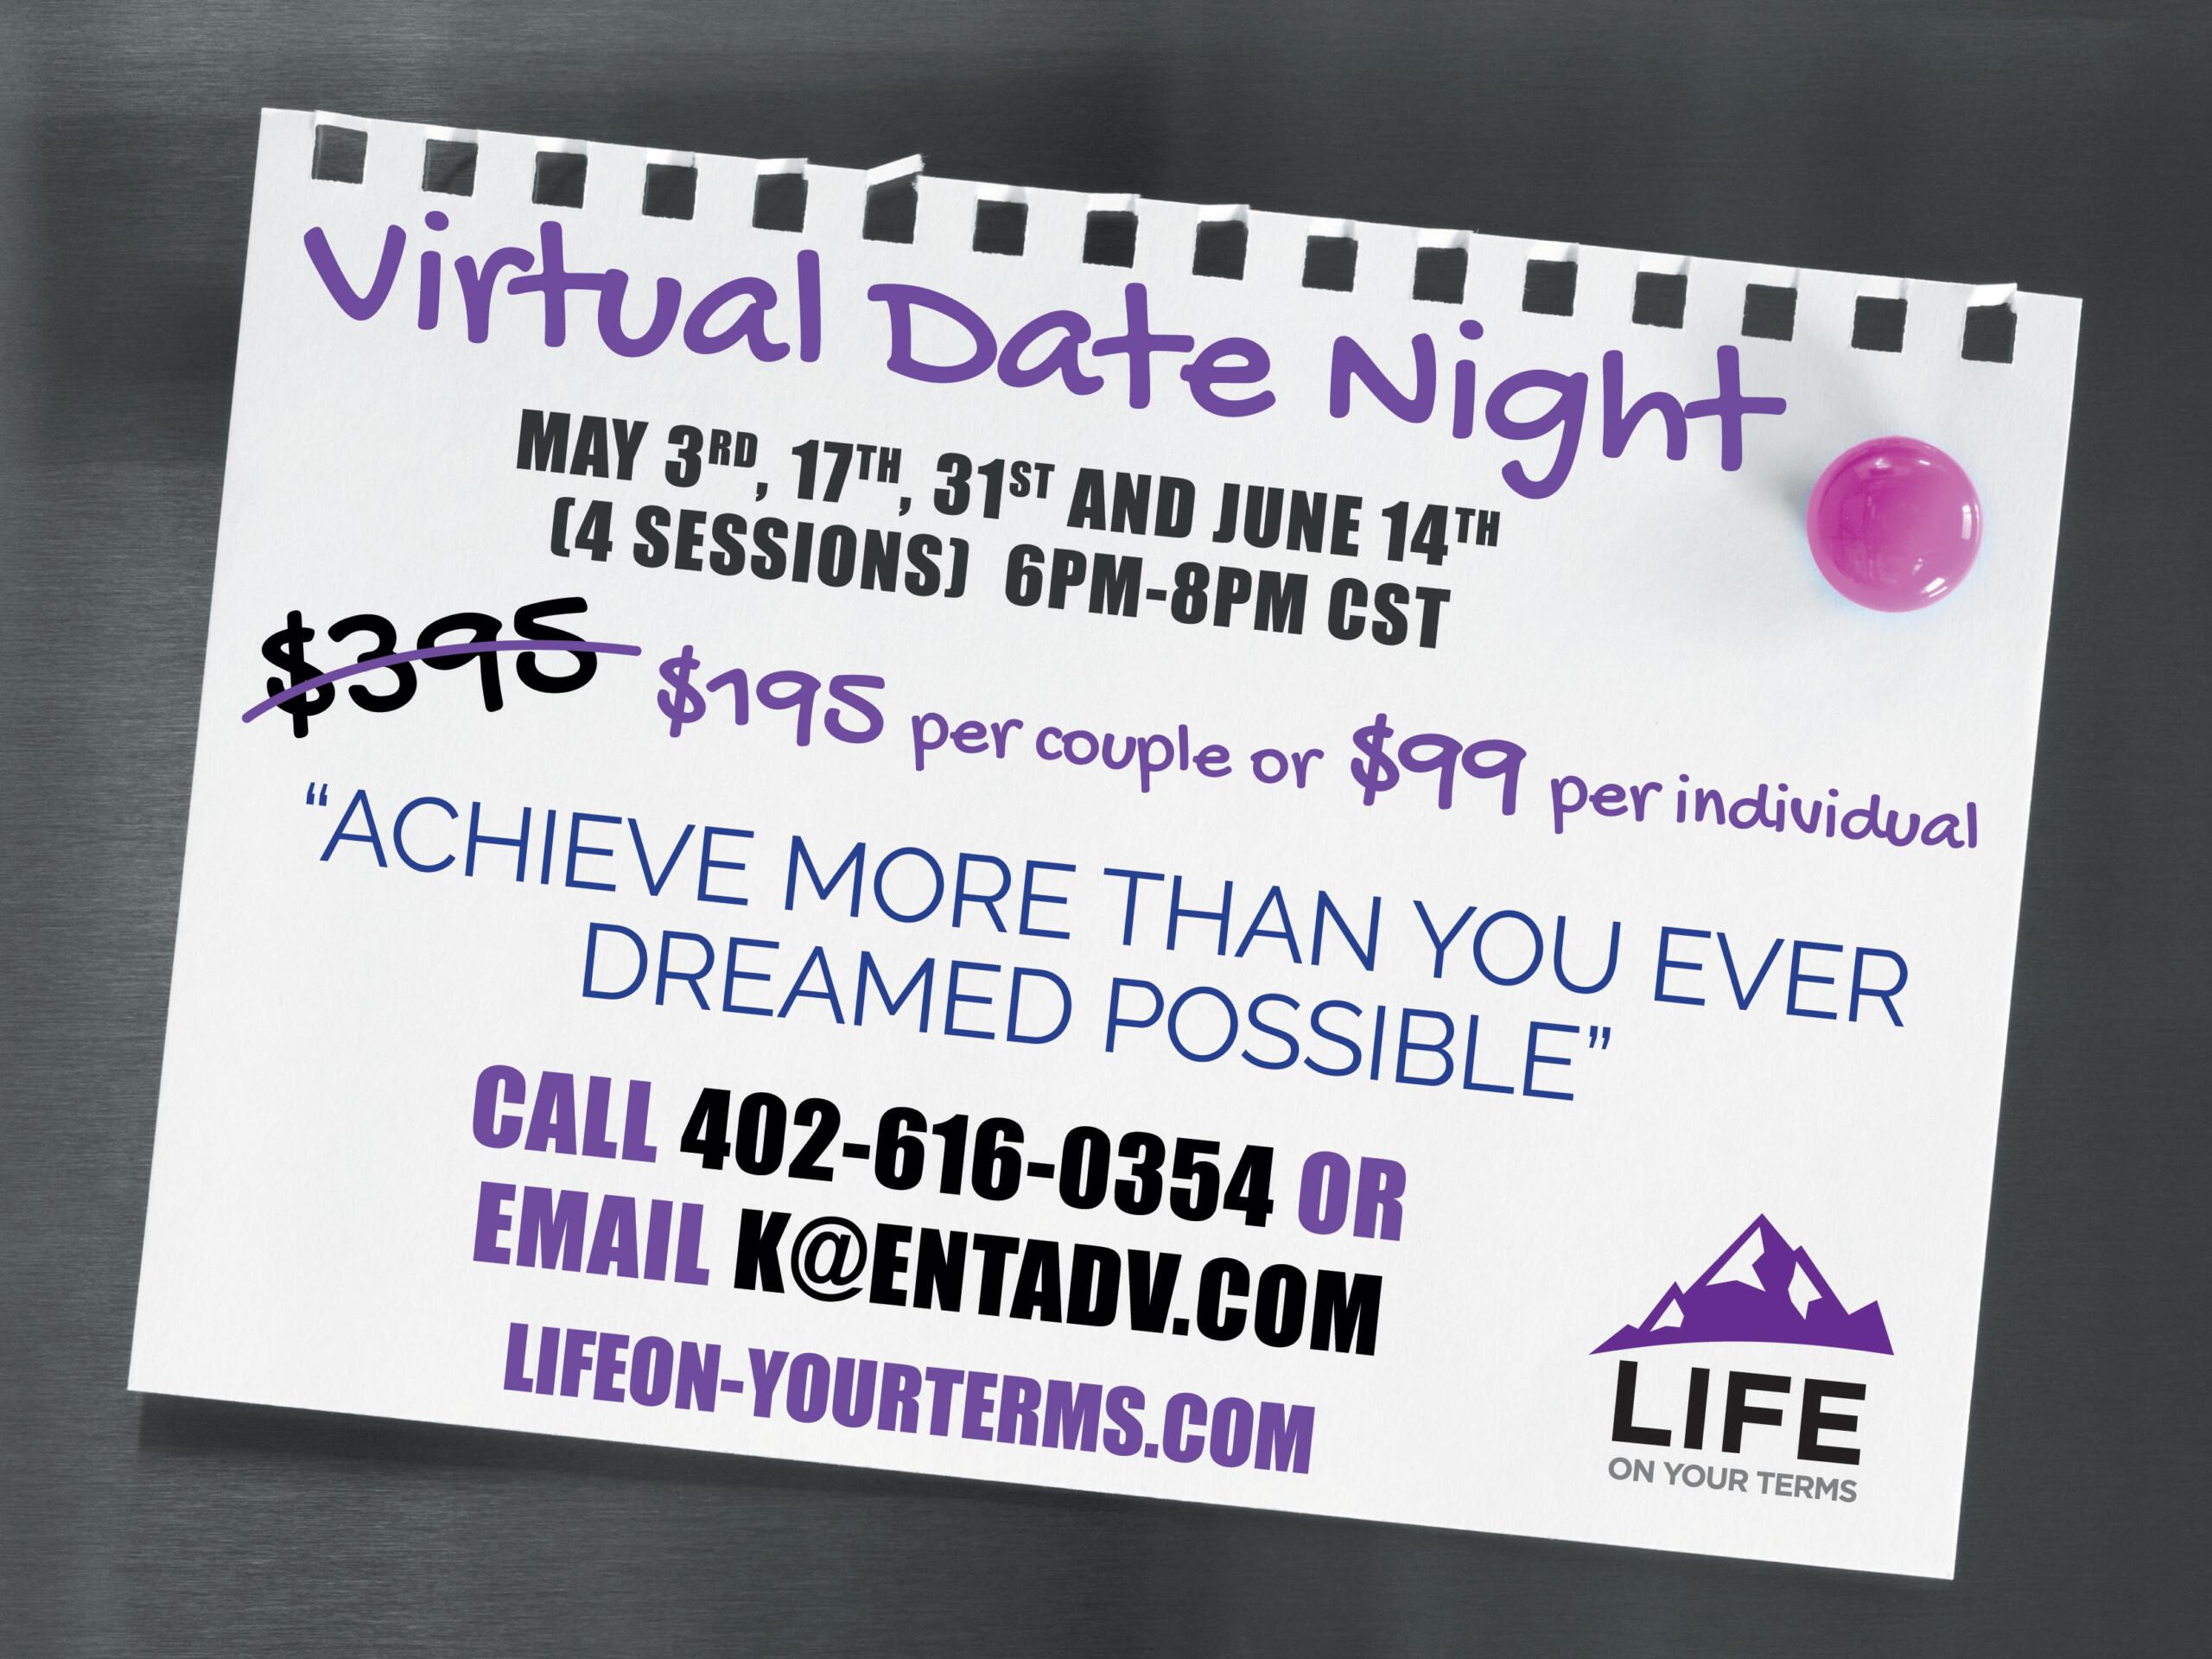 Date-Night-Social-Advert-May-3rd-WEB